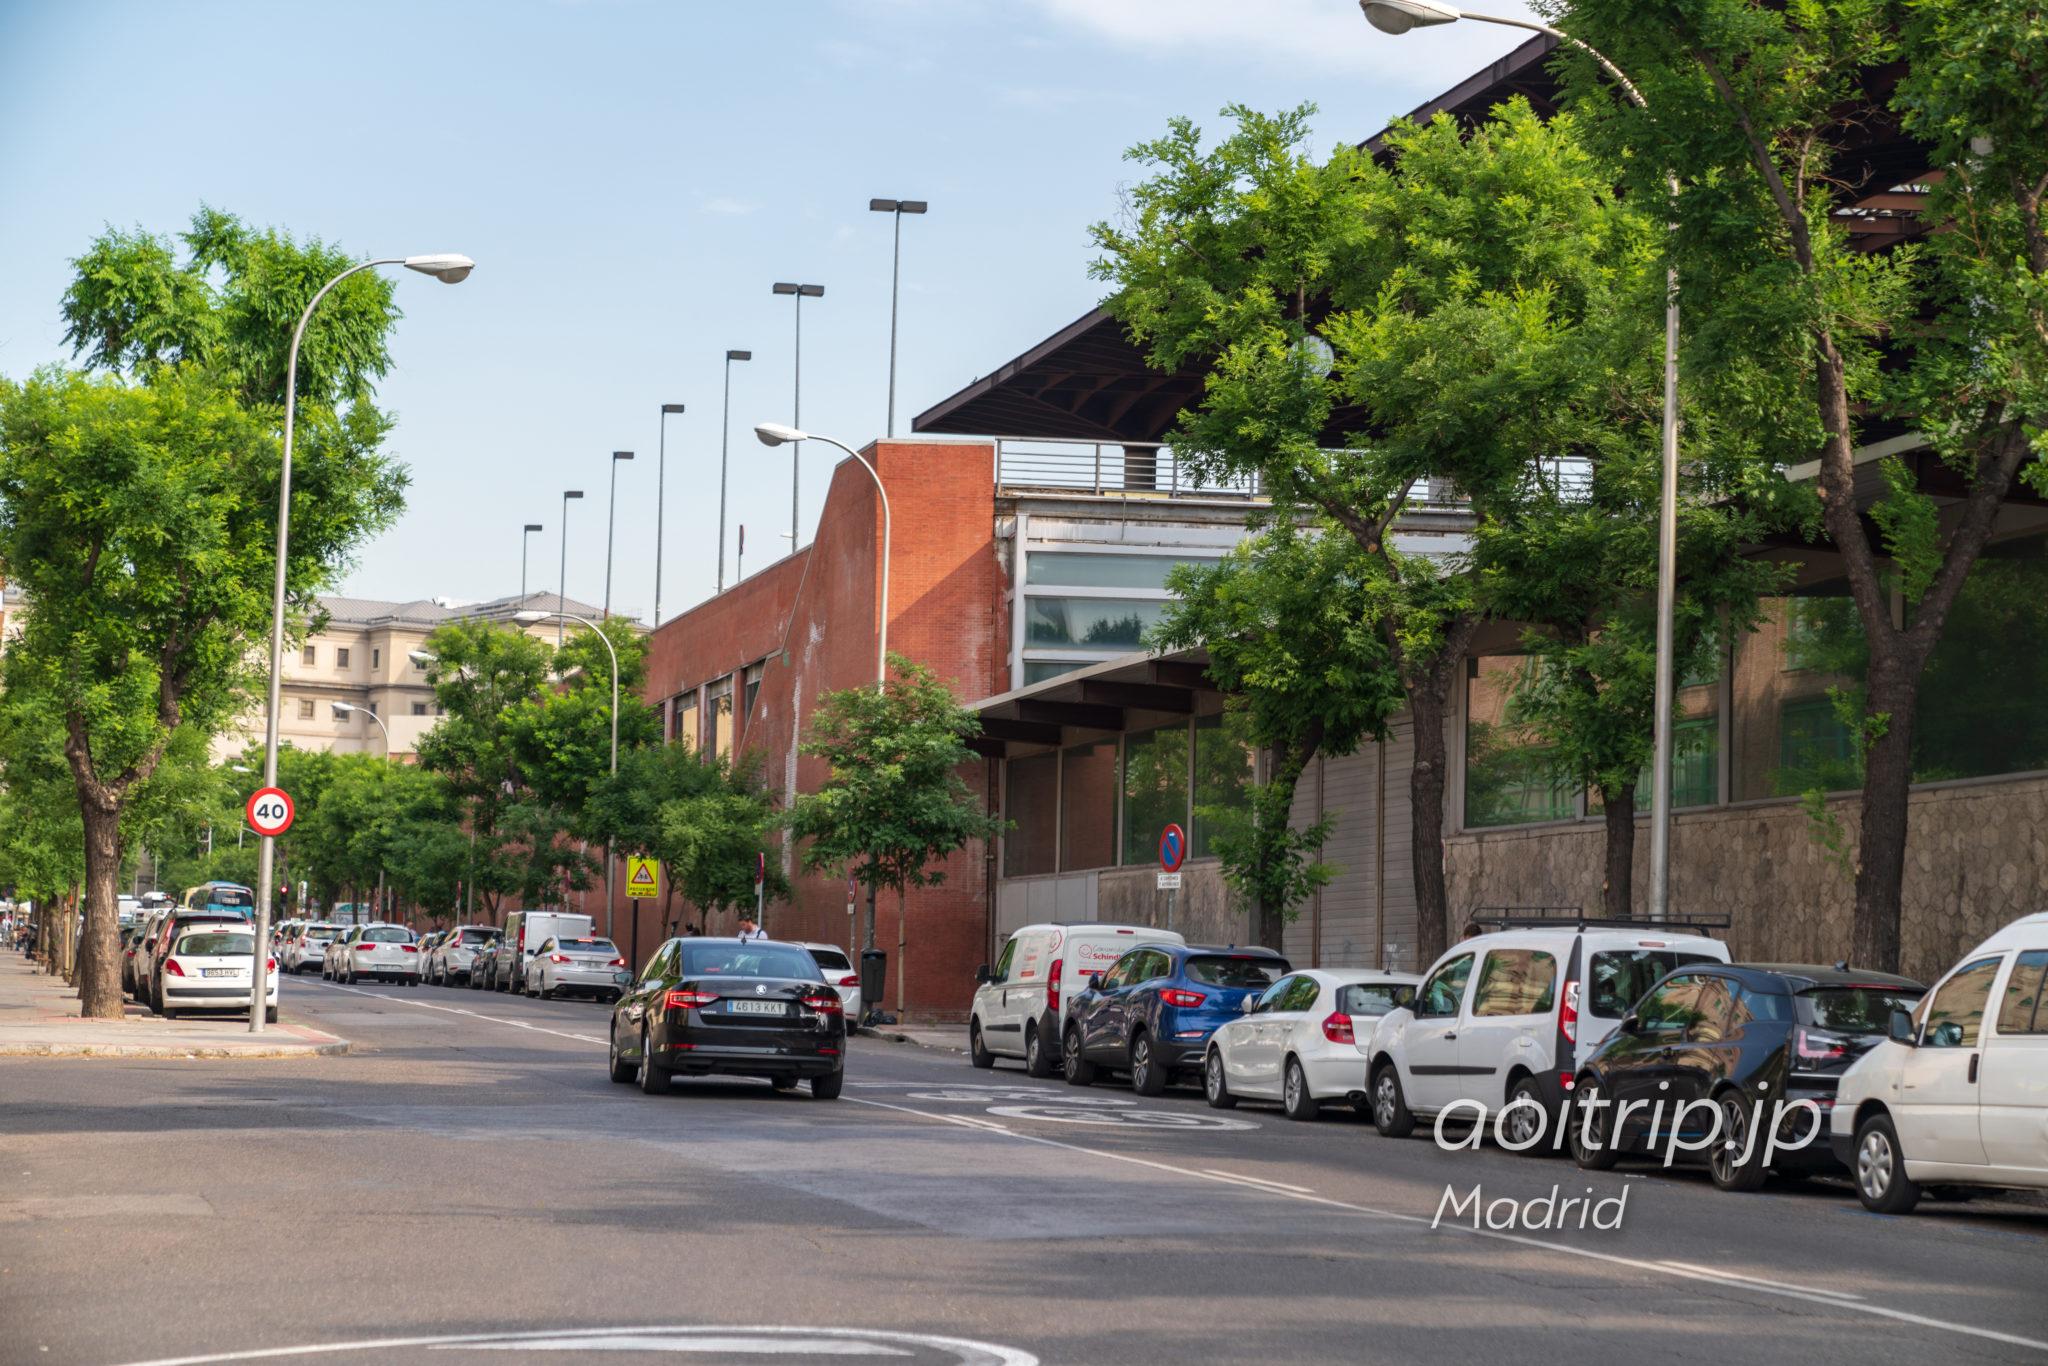 ACホテル マドリッド アトーチャからプエルタデアトーチャ駅までの道